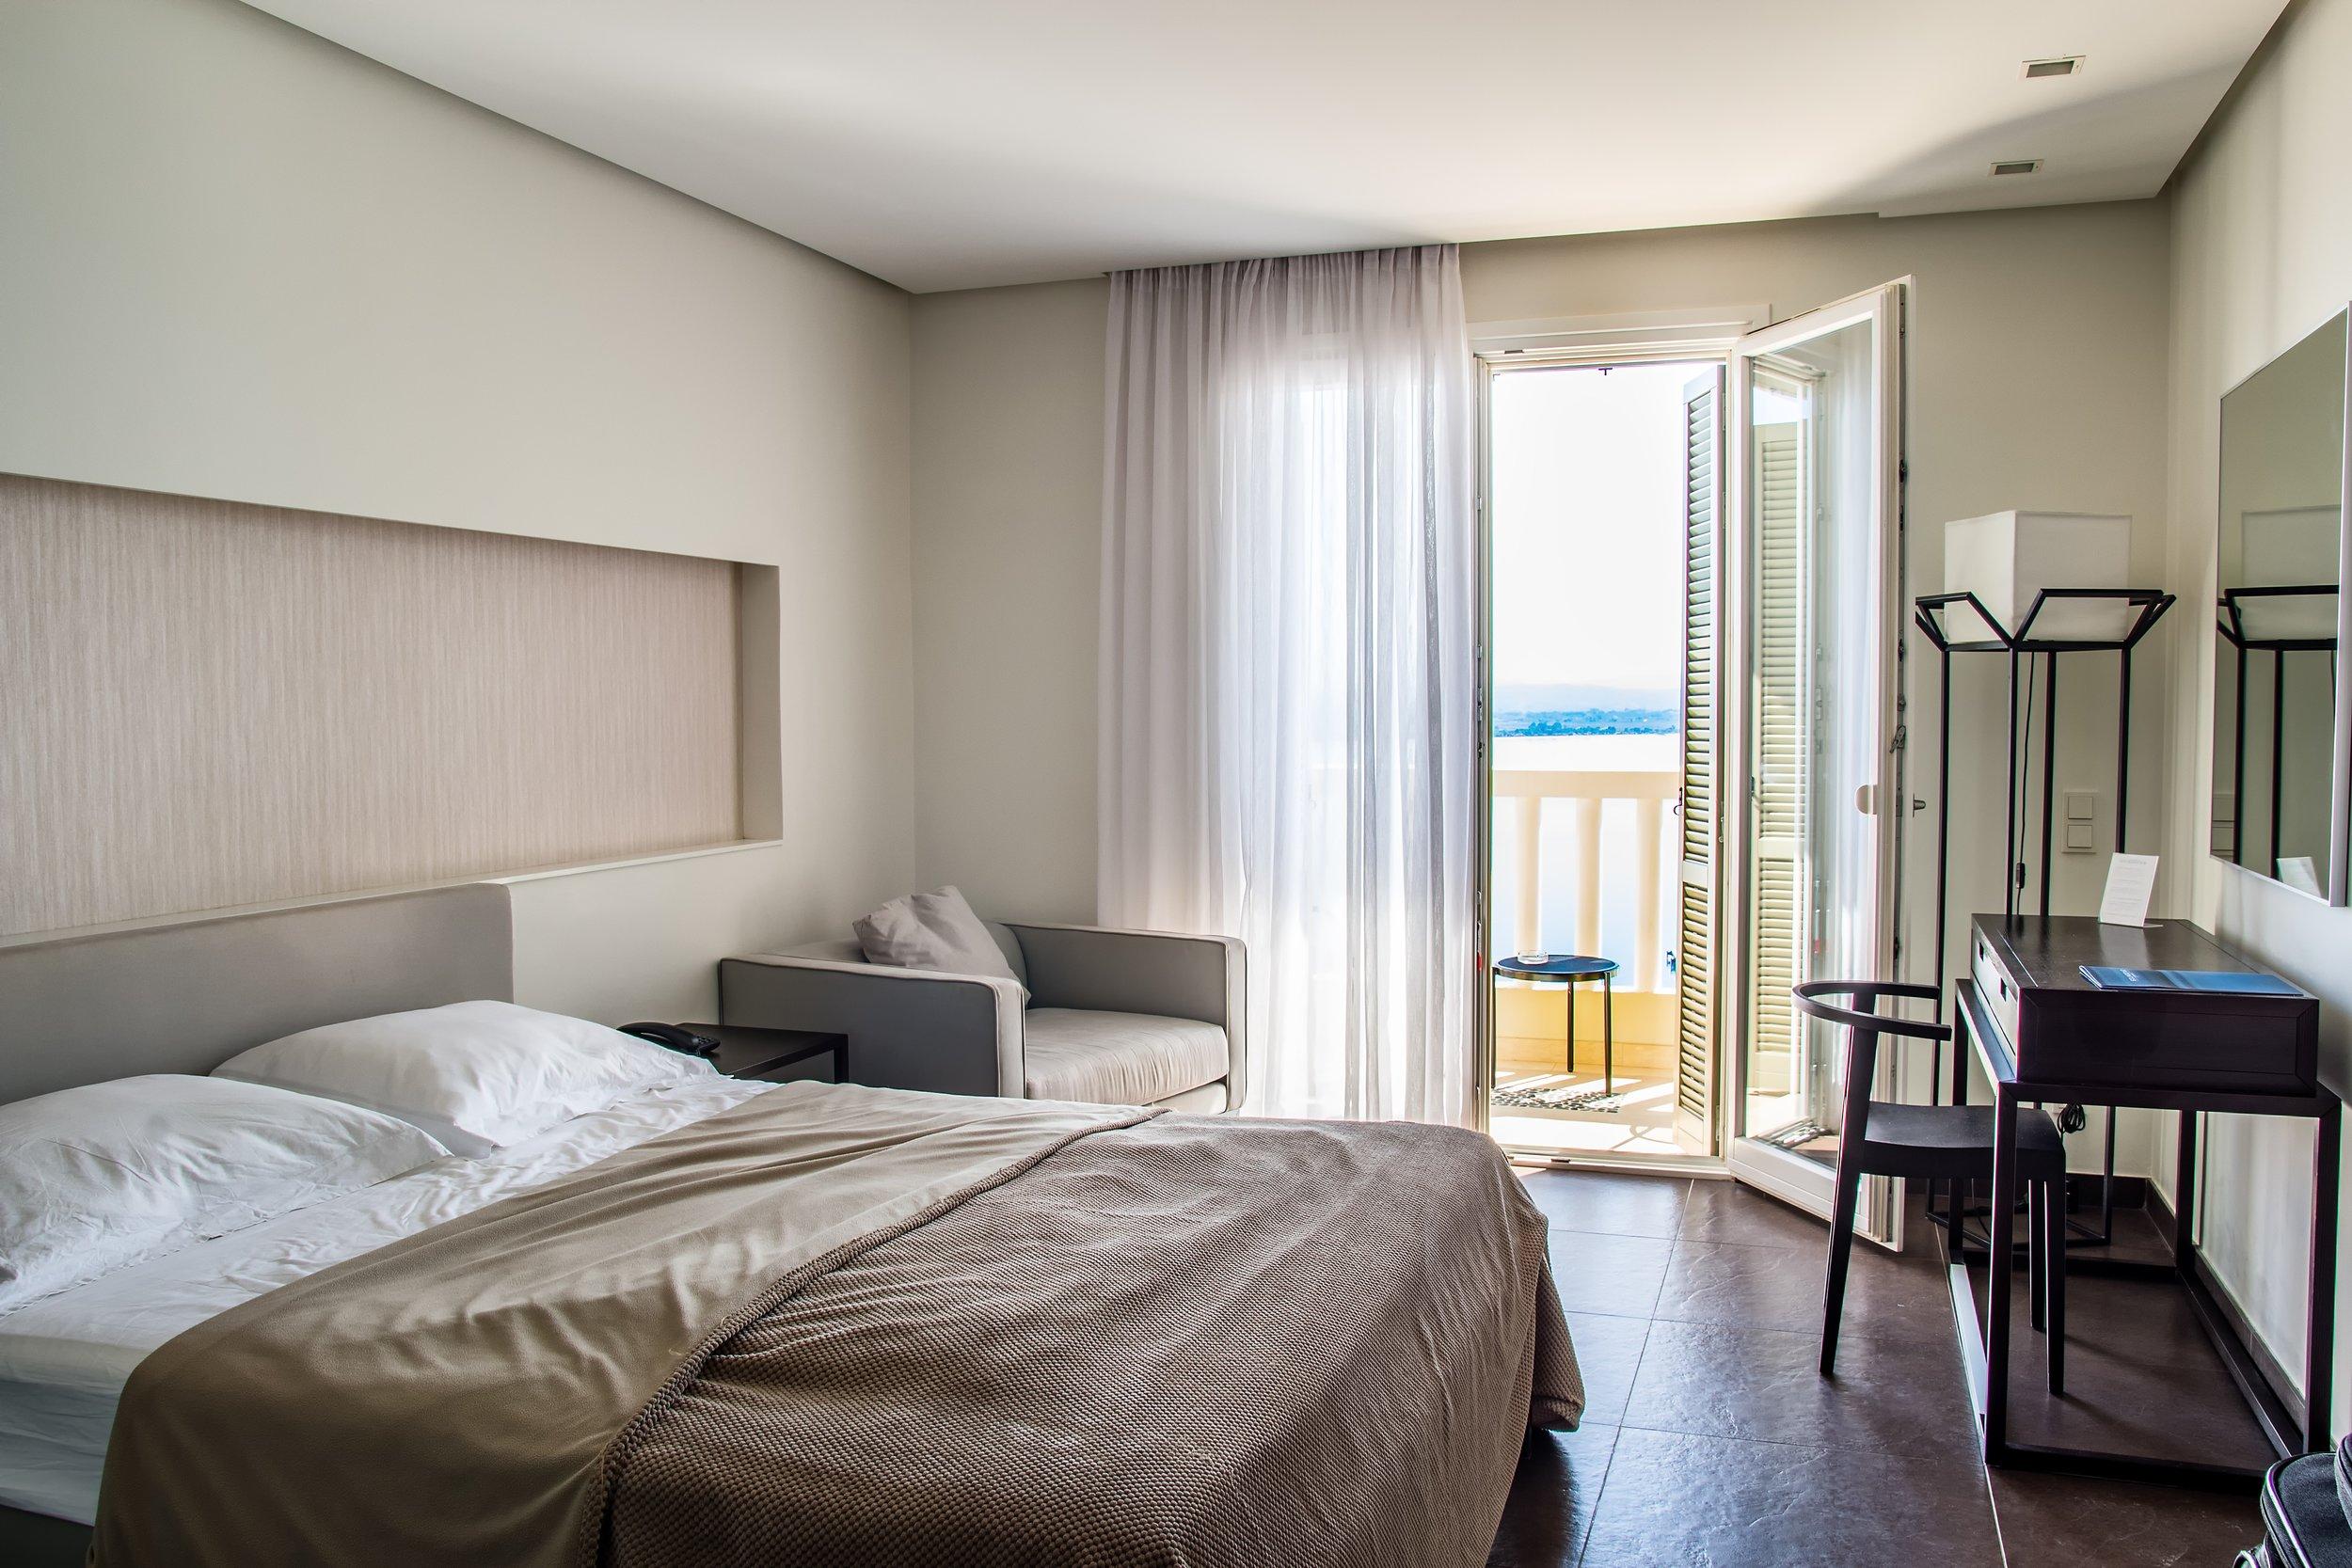 uwm.hotel.floor-interior-home-tourist-travel-ceiling-487768-pxhere.com